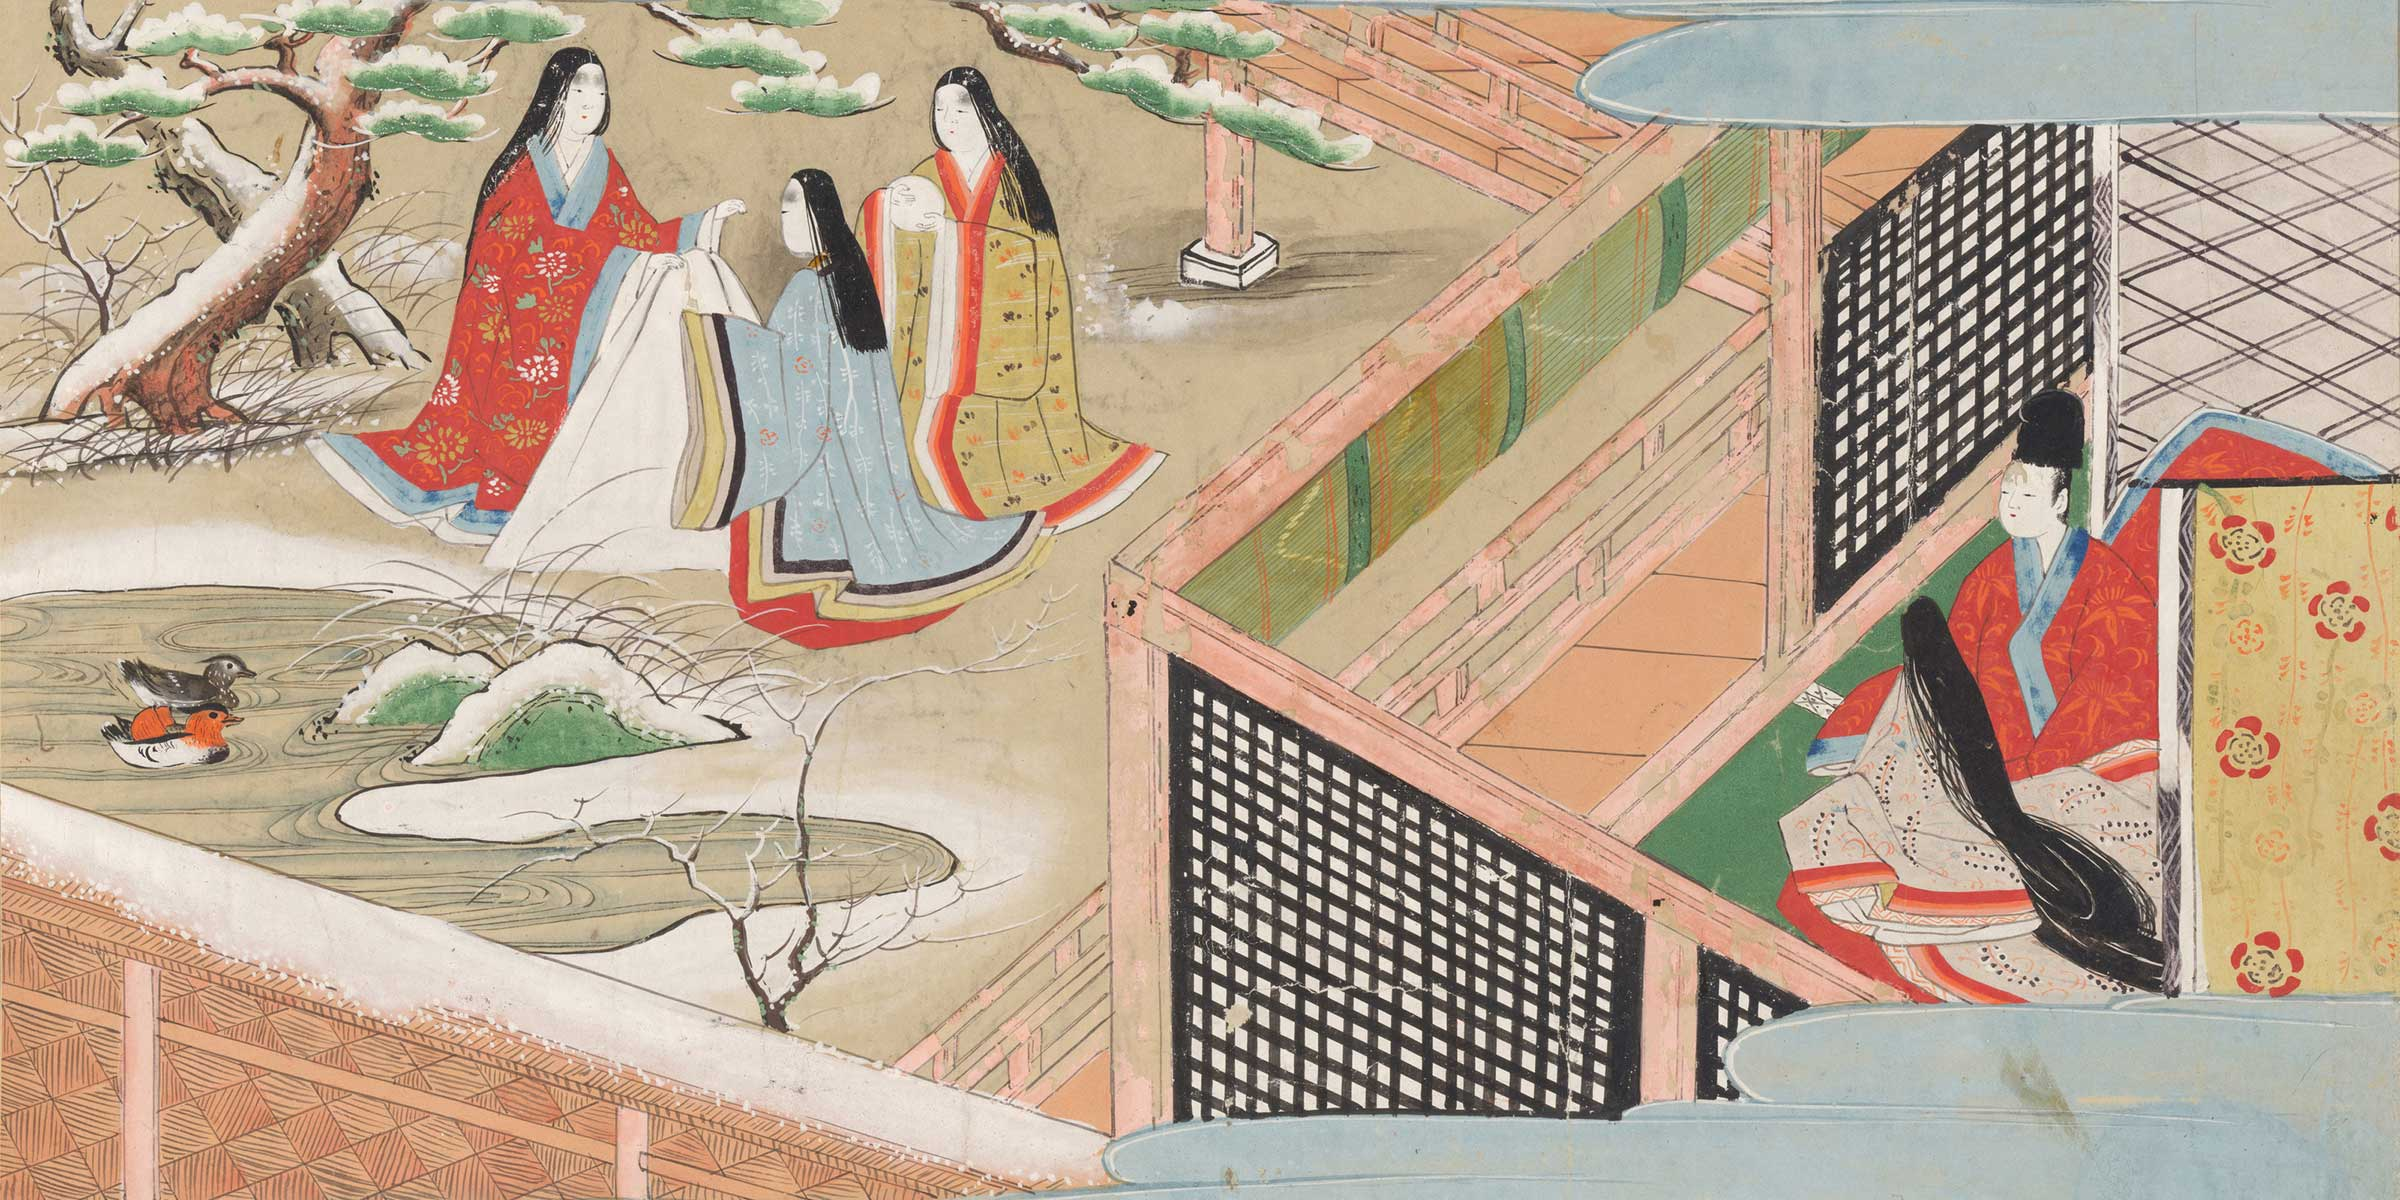 Illustration of a scene from Murasaki Shikibu's The Tale of Genji, by Ryujo, 1594.